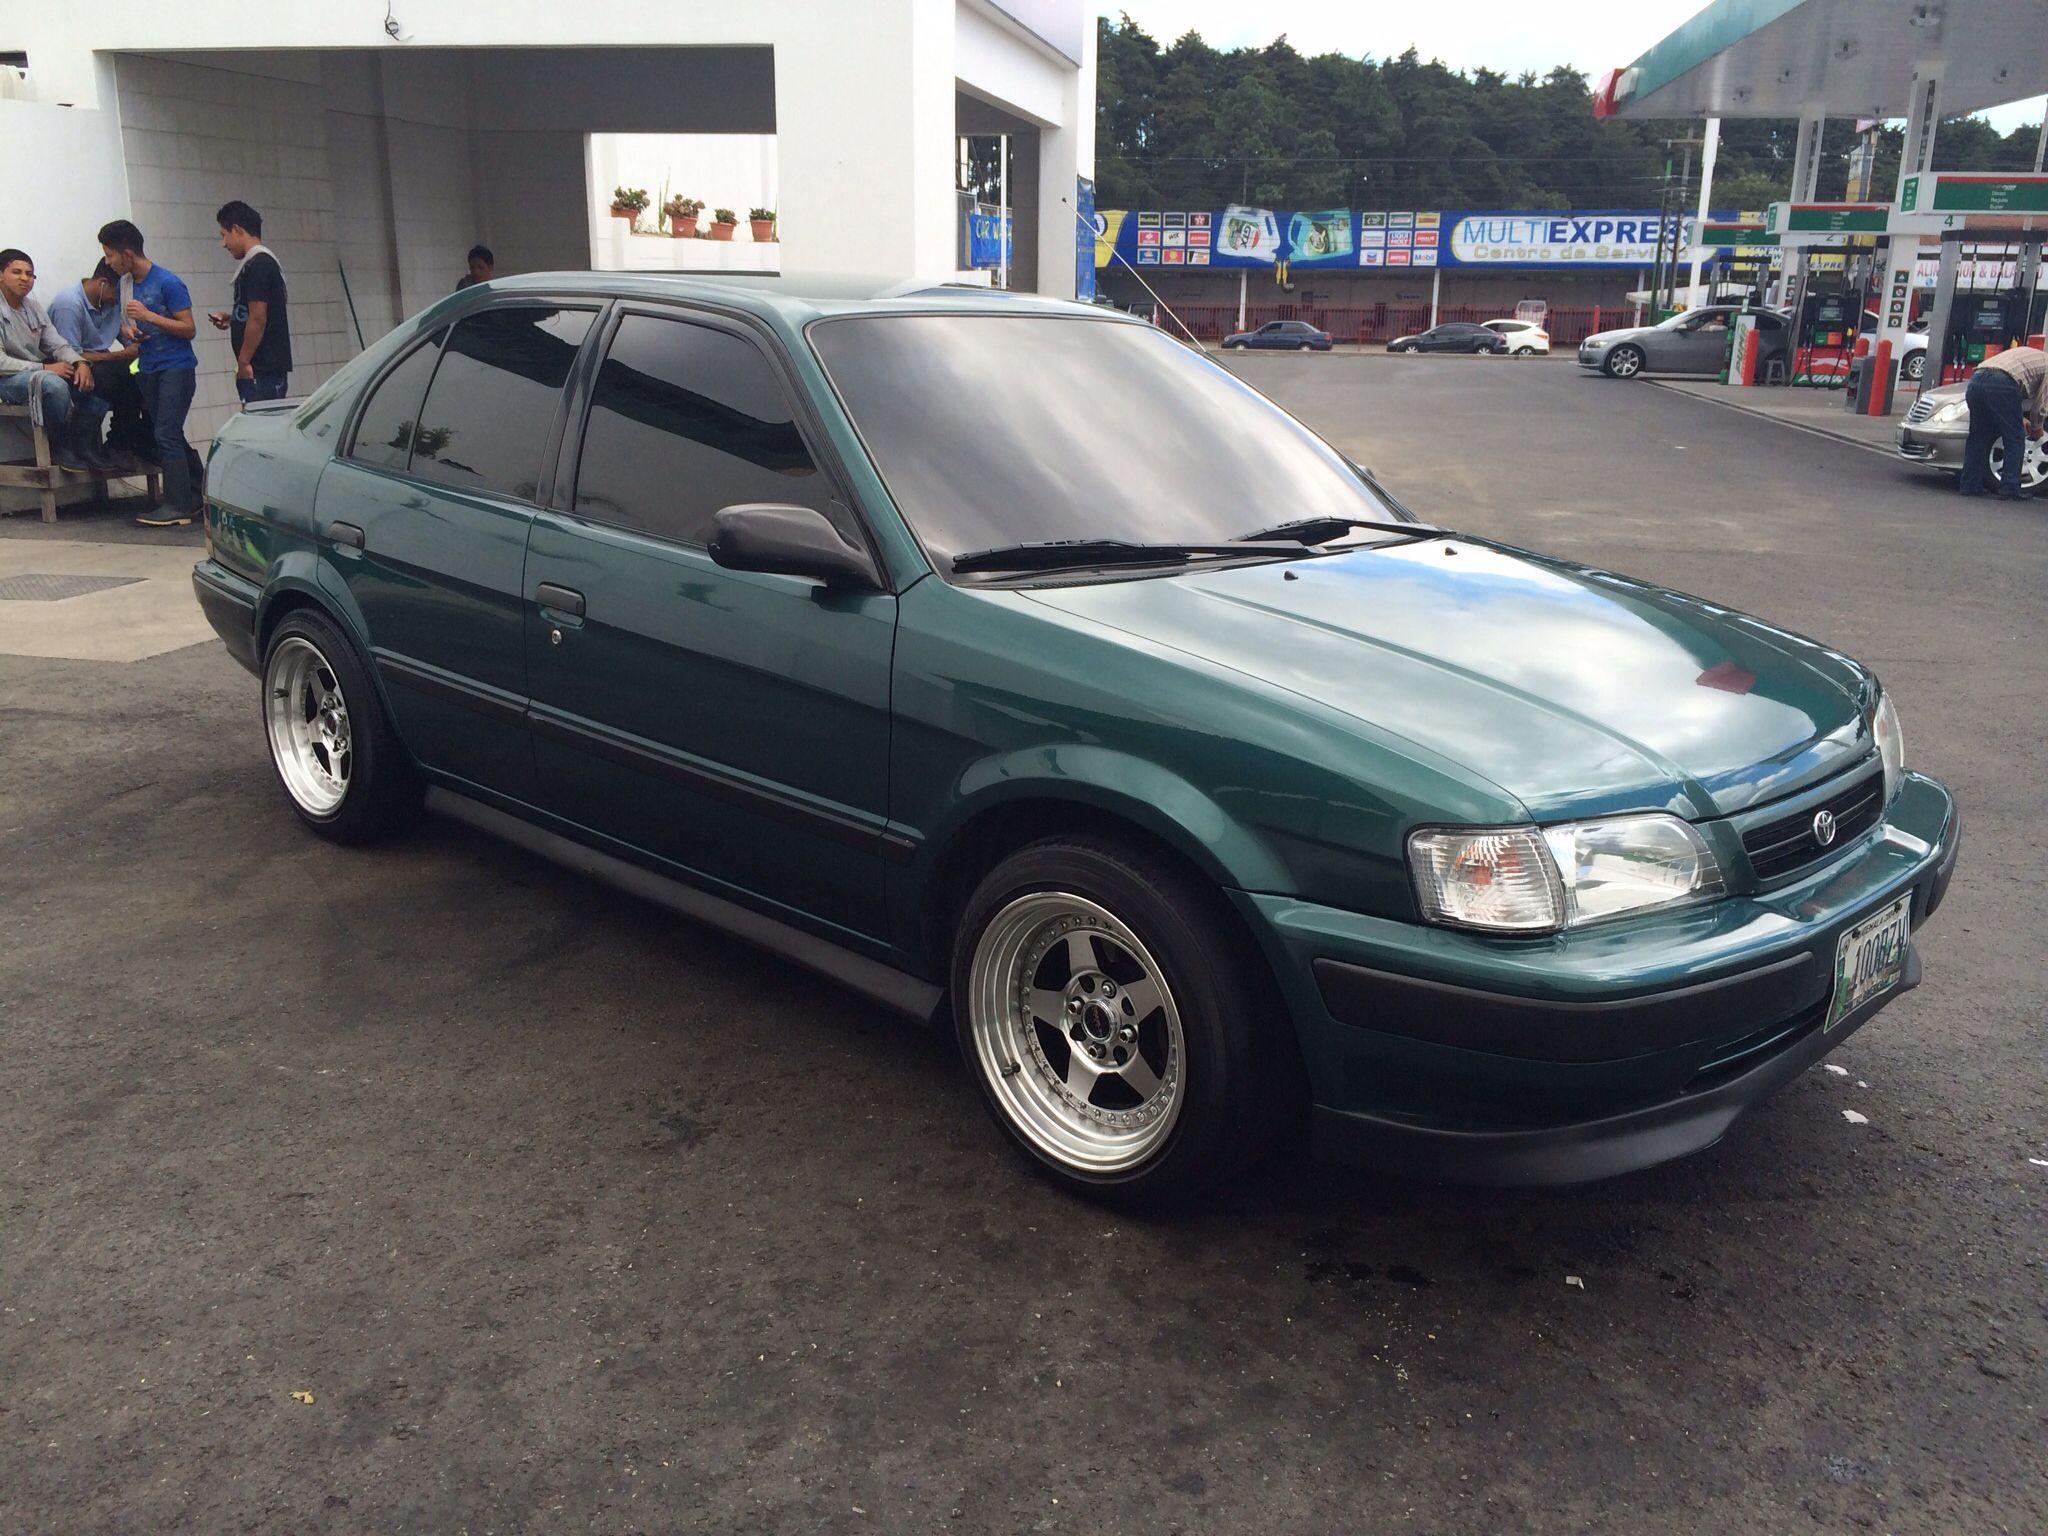 Toyota Tercel 98 Tt Rodas Toyota Tercel Toyota Y Vehicles